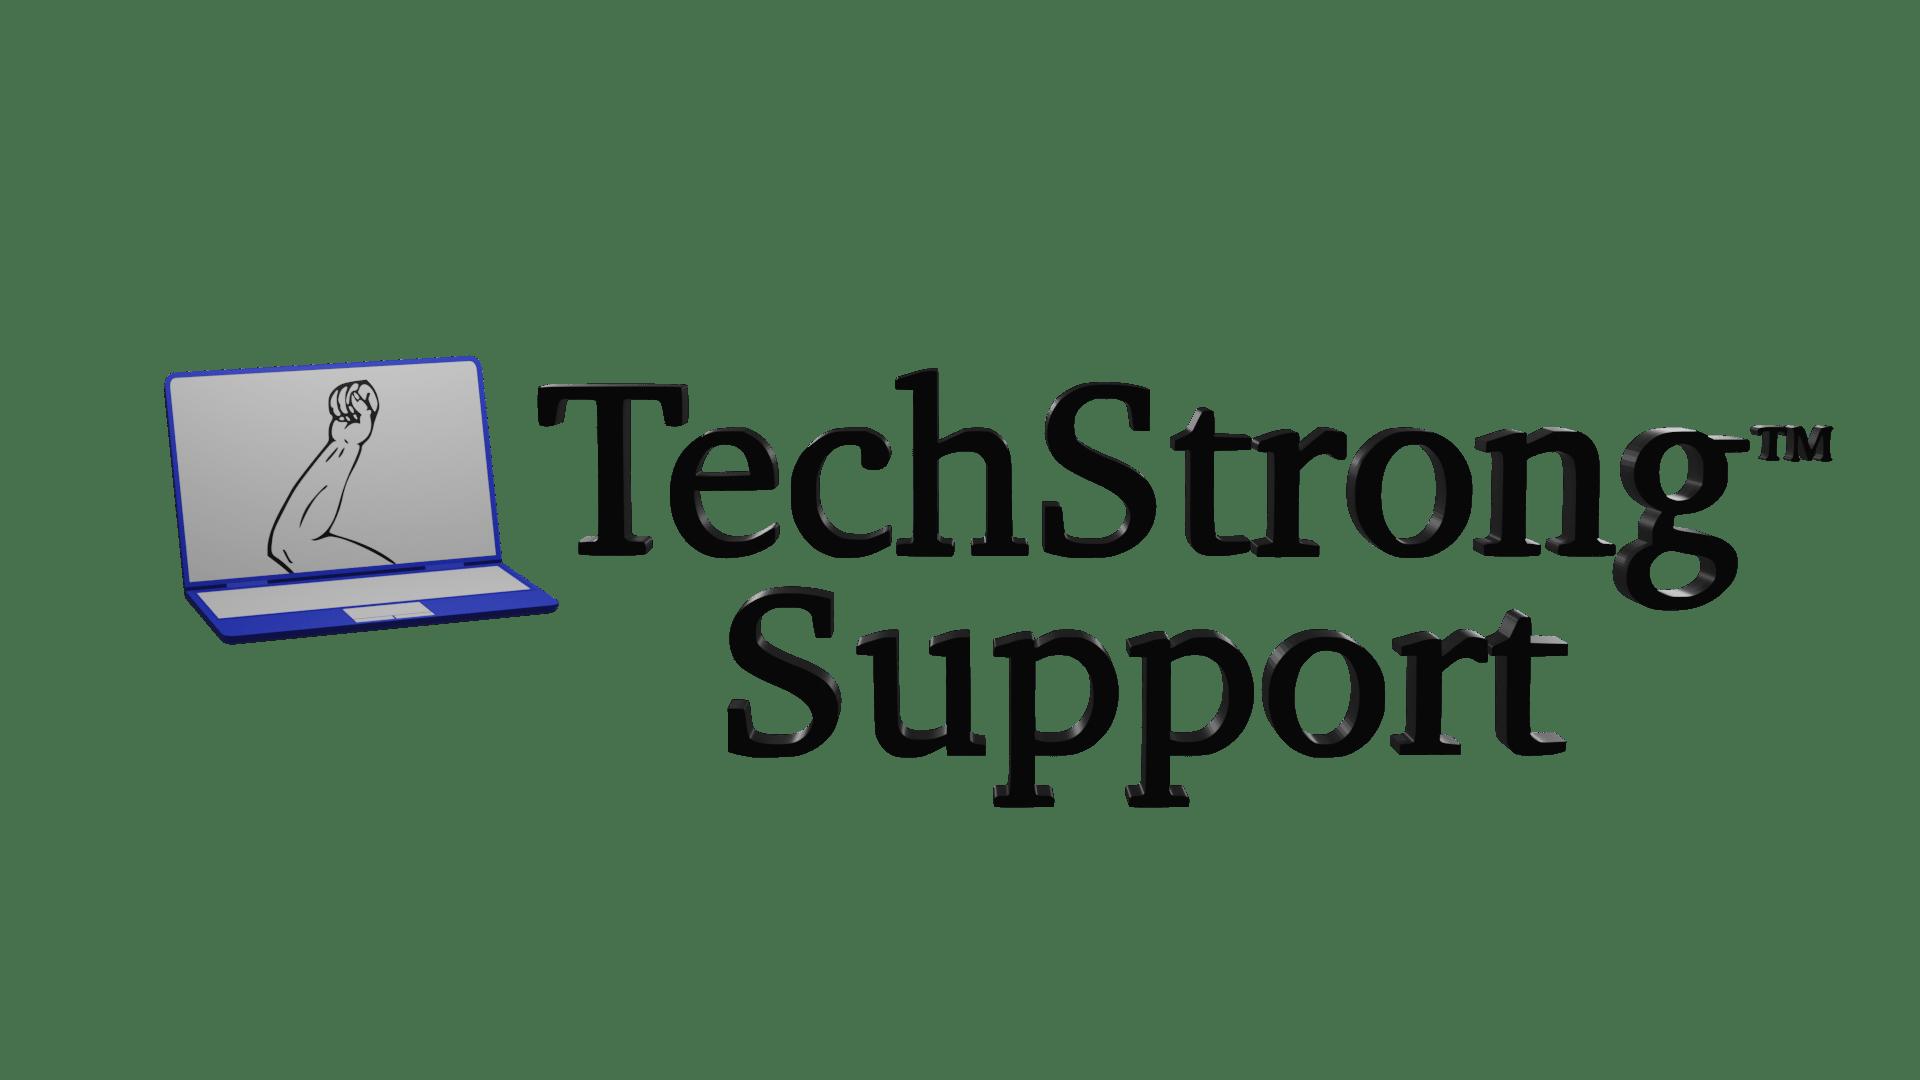 techstrong support